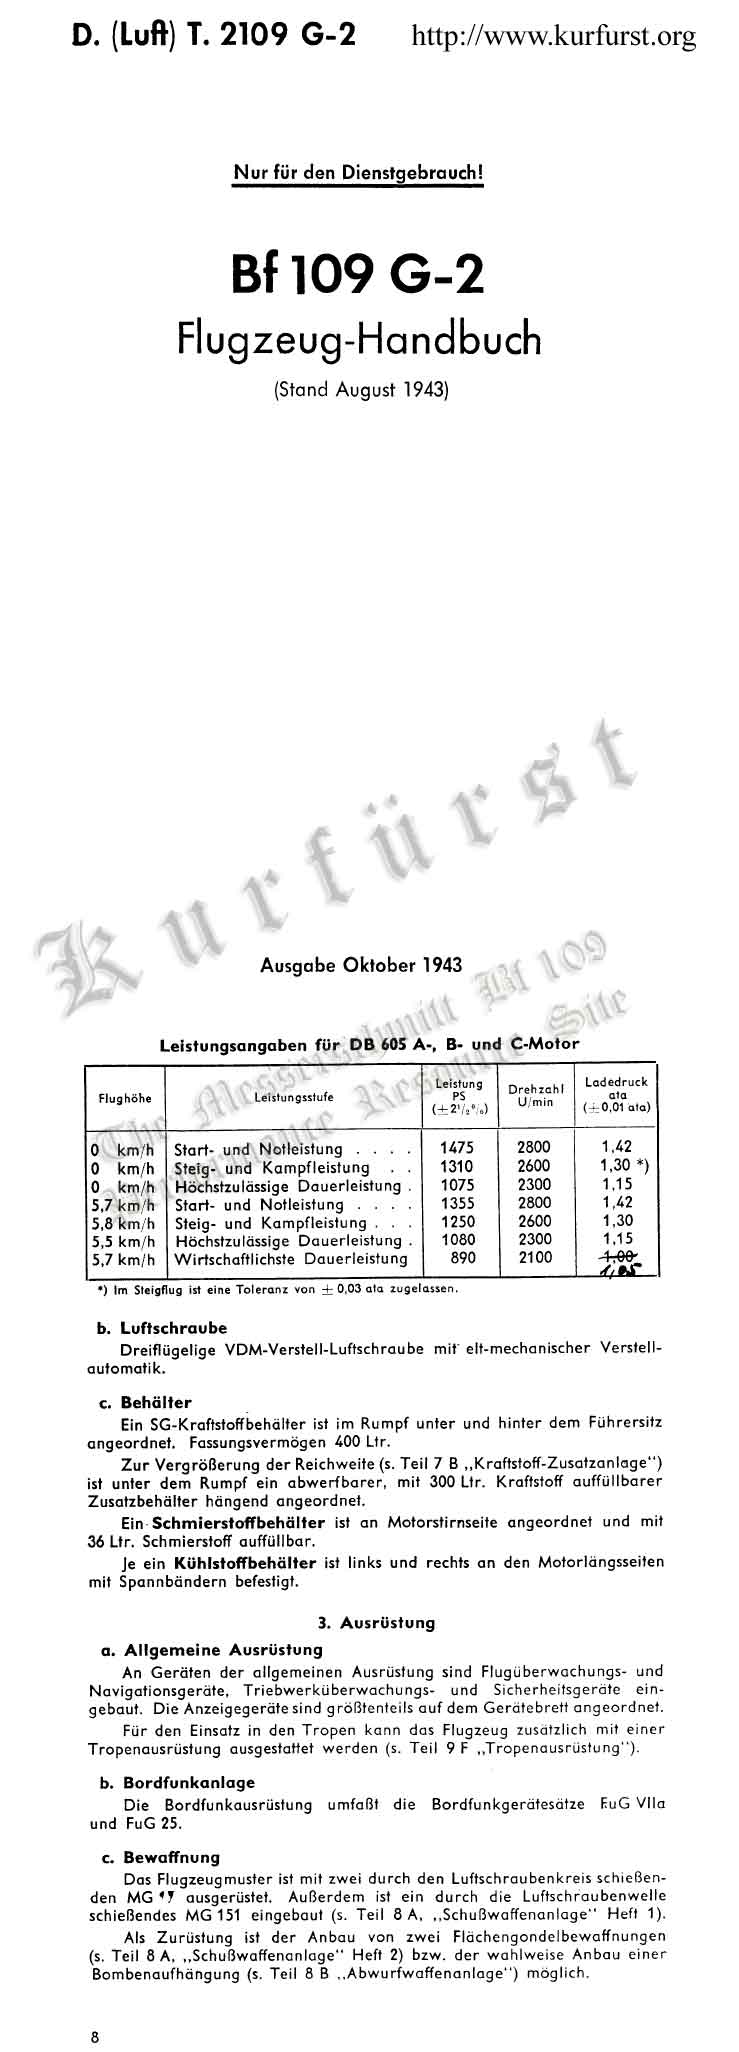 DB605A_clearance_Aug-Oct43_G2FzgHB-T0-Fu